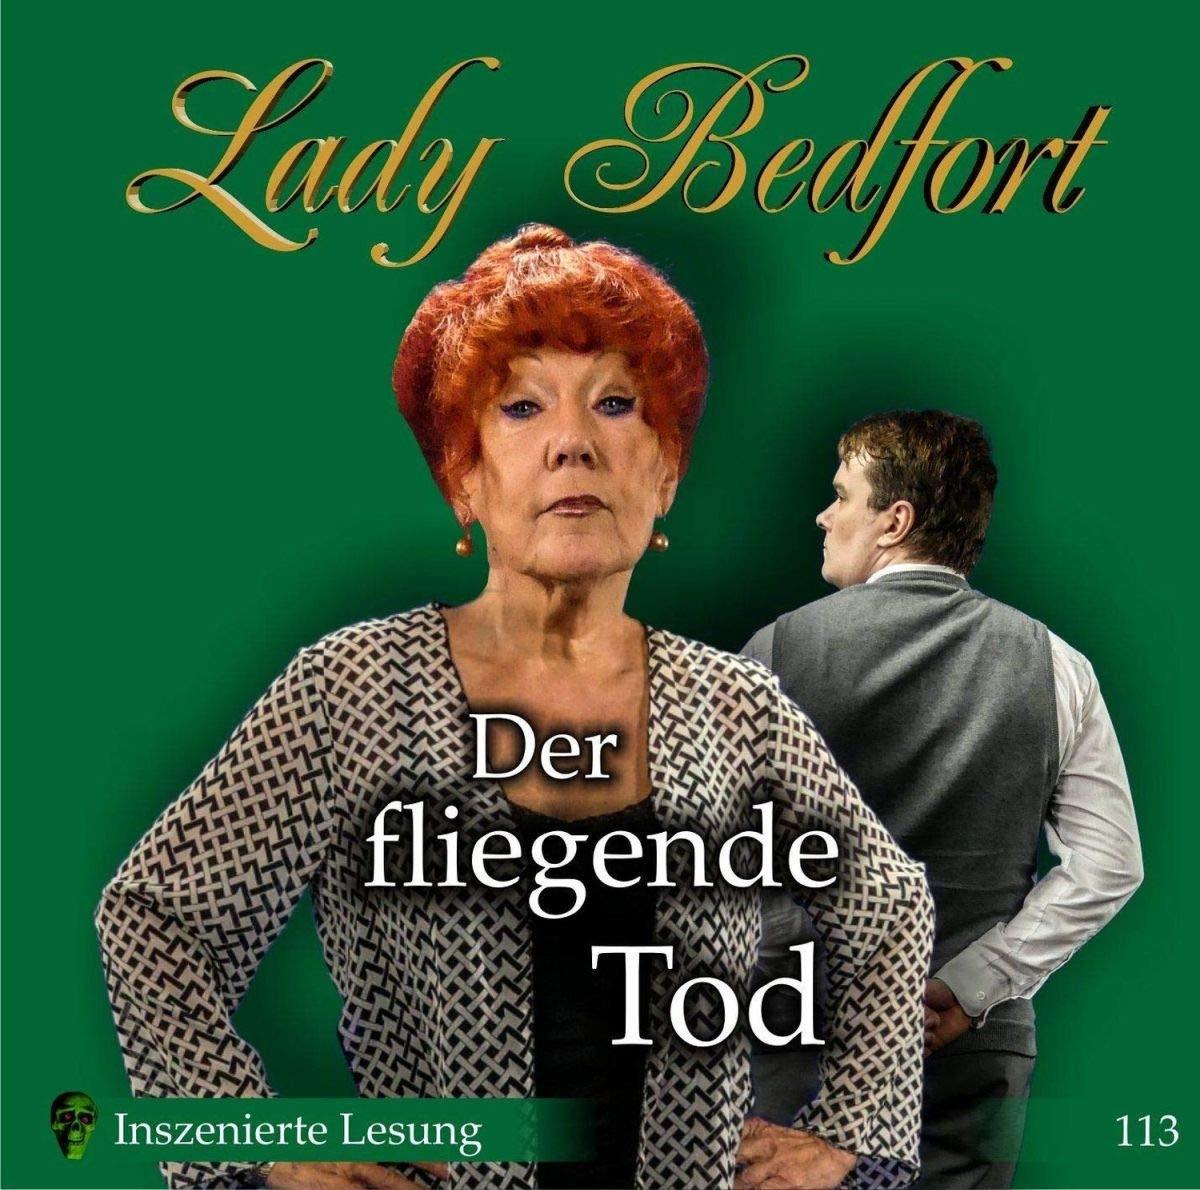 Lady Bedfort - Folge 113: Der fliegende Tod (Inszenierte Lesung)